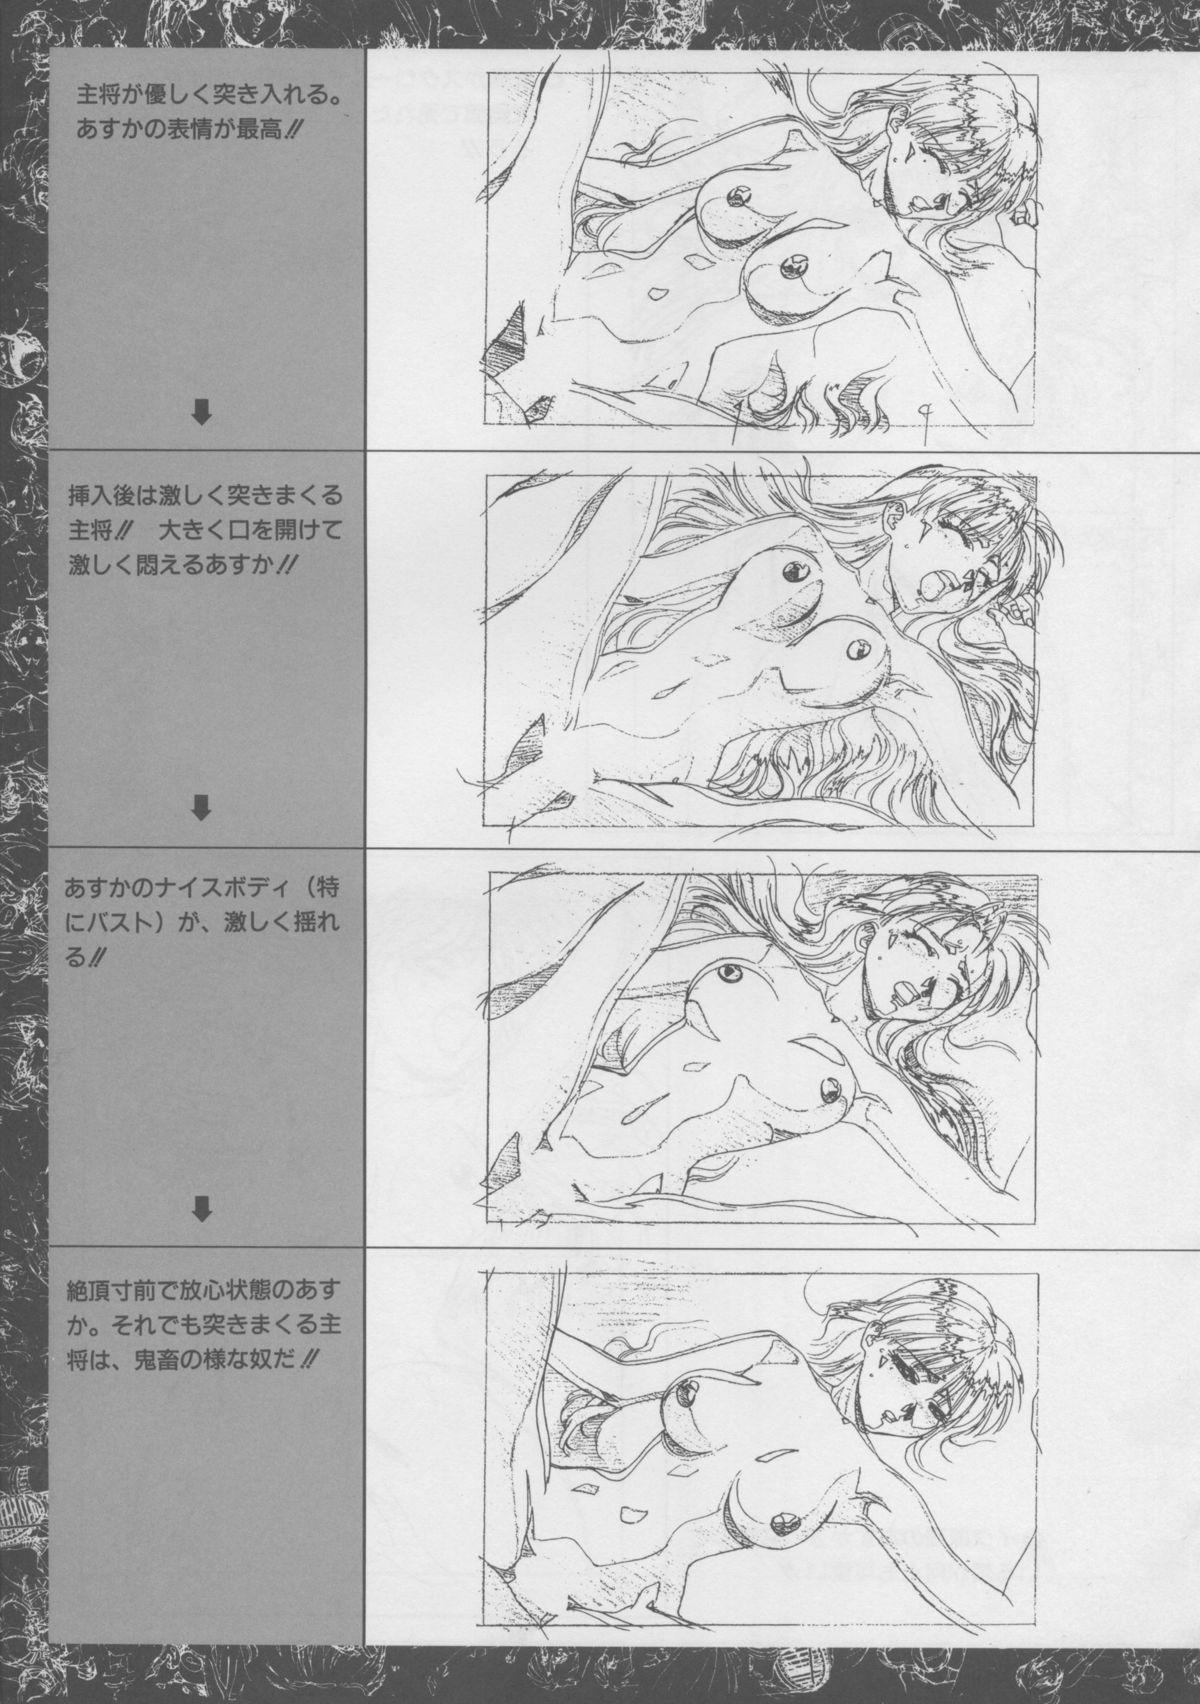 VIPER Series Official Artbook 69